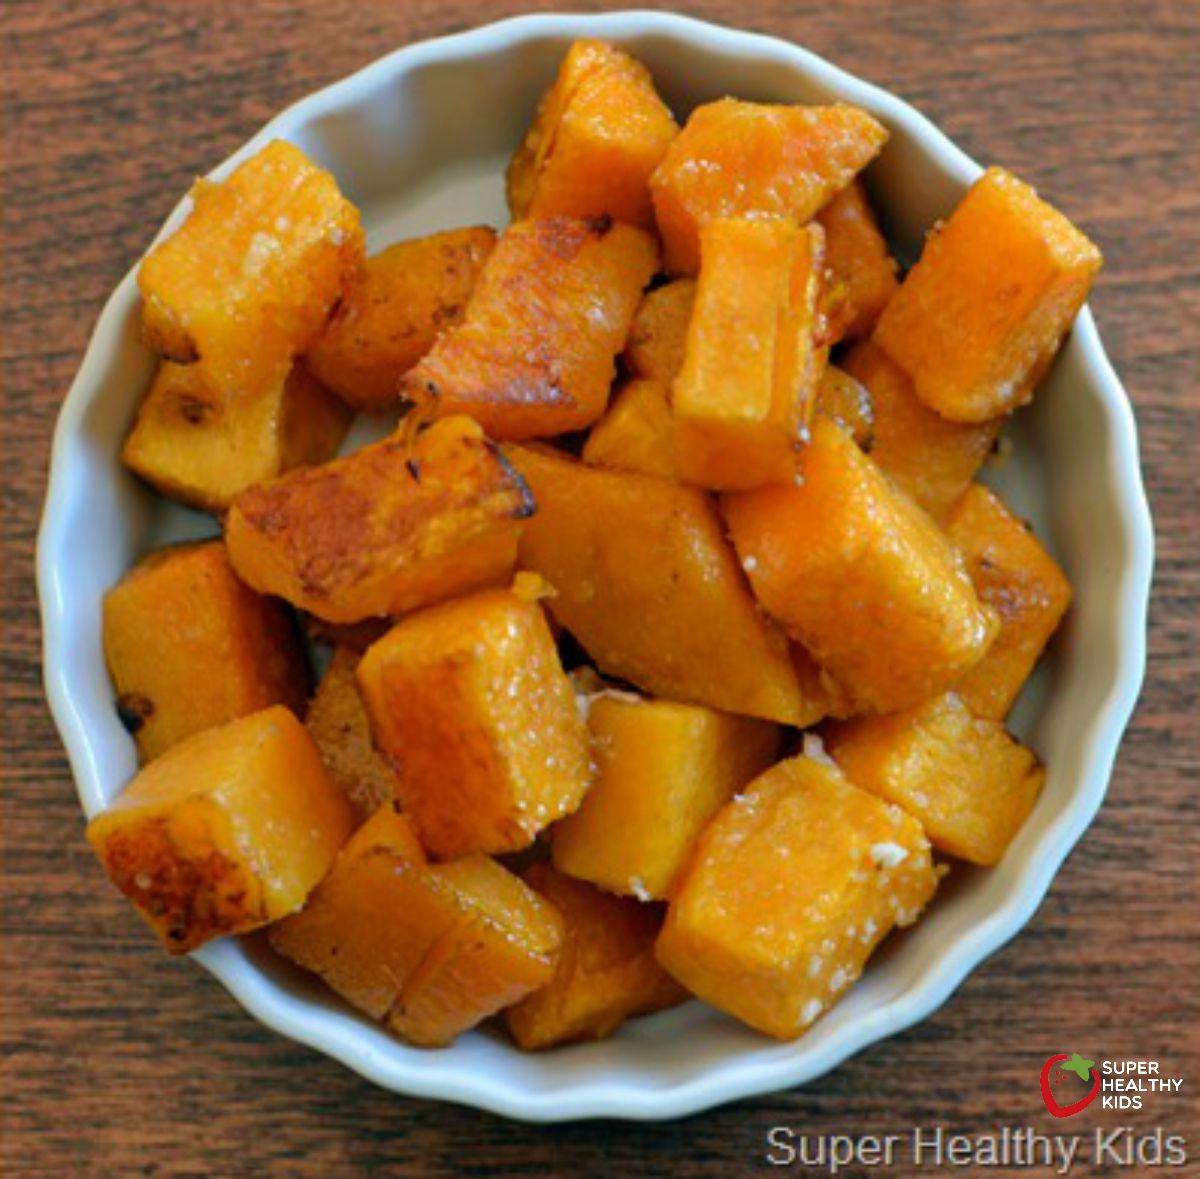 Easy Vegetables: Roasted Butternut Squash Recipe